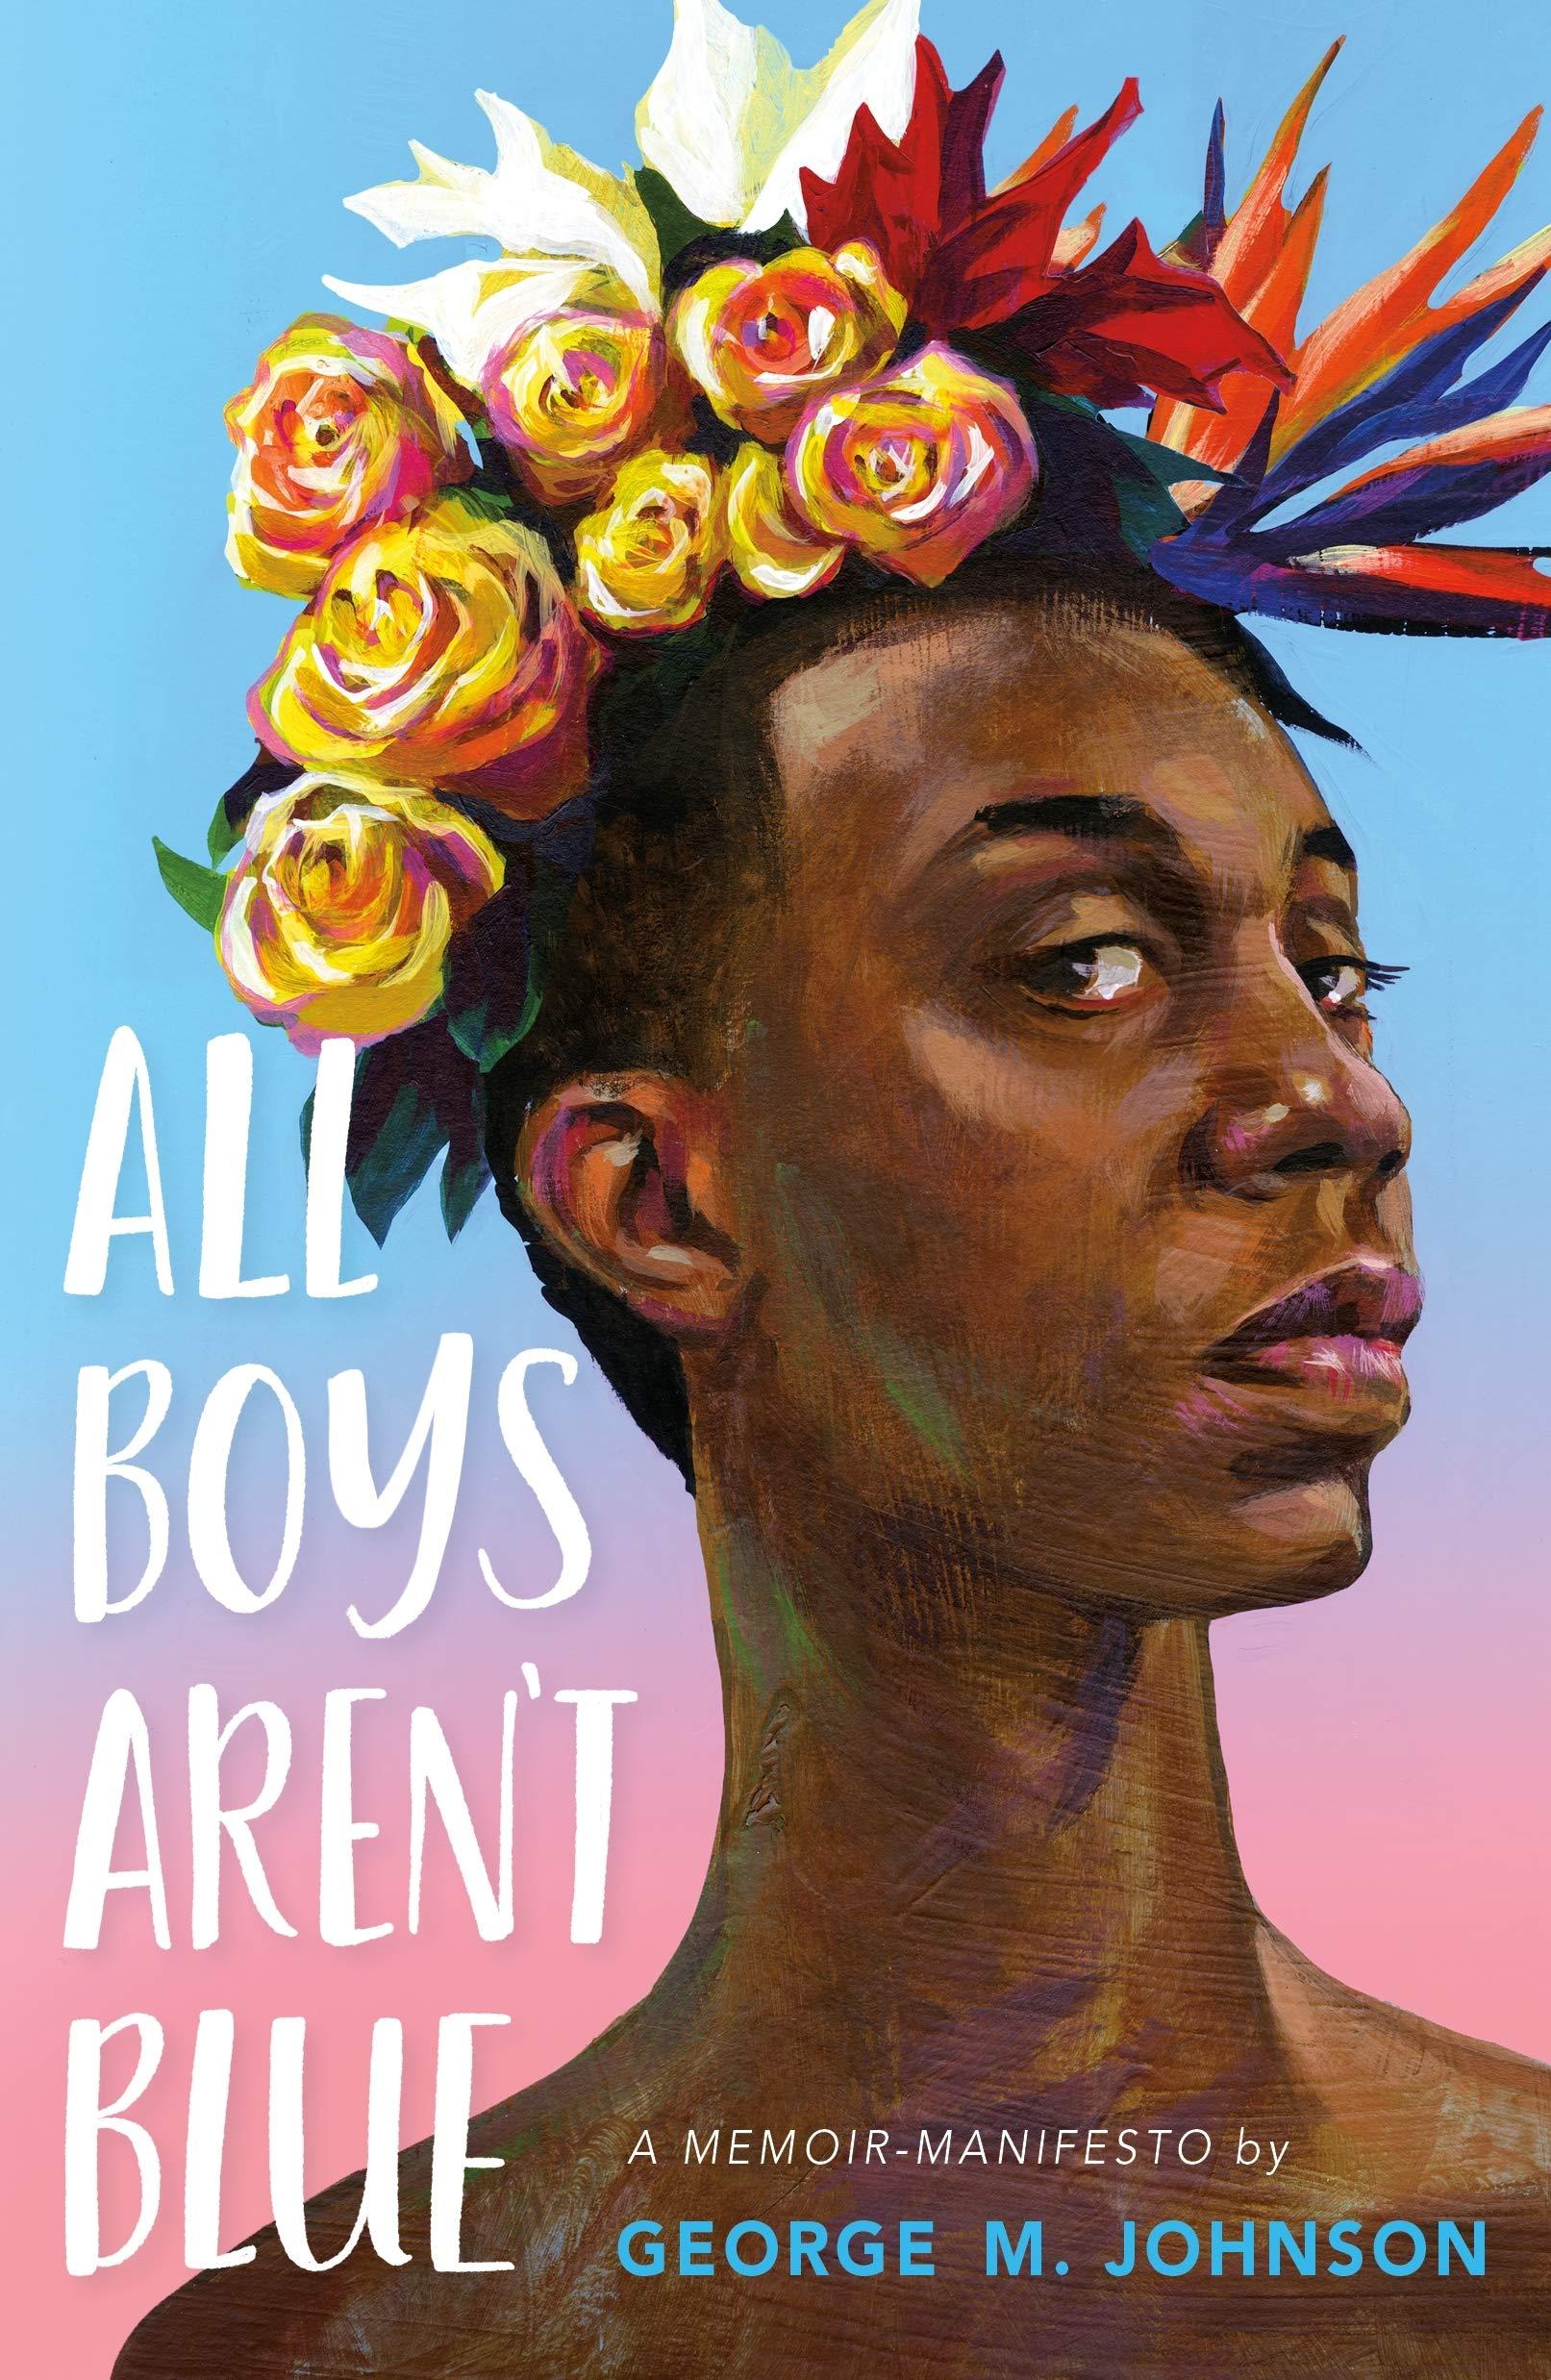 Amazon.com: All Boys Aren't Blue: A Memoir-Manifesto (9780374312718):  Johnson, George M.: Books